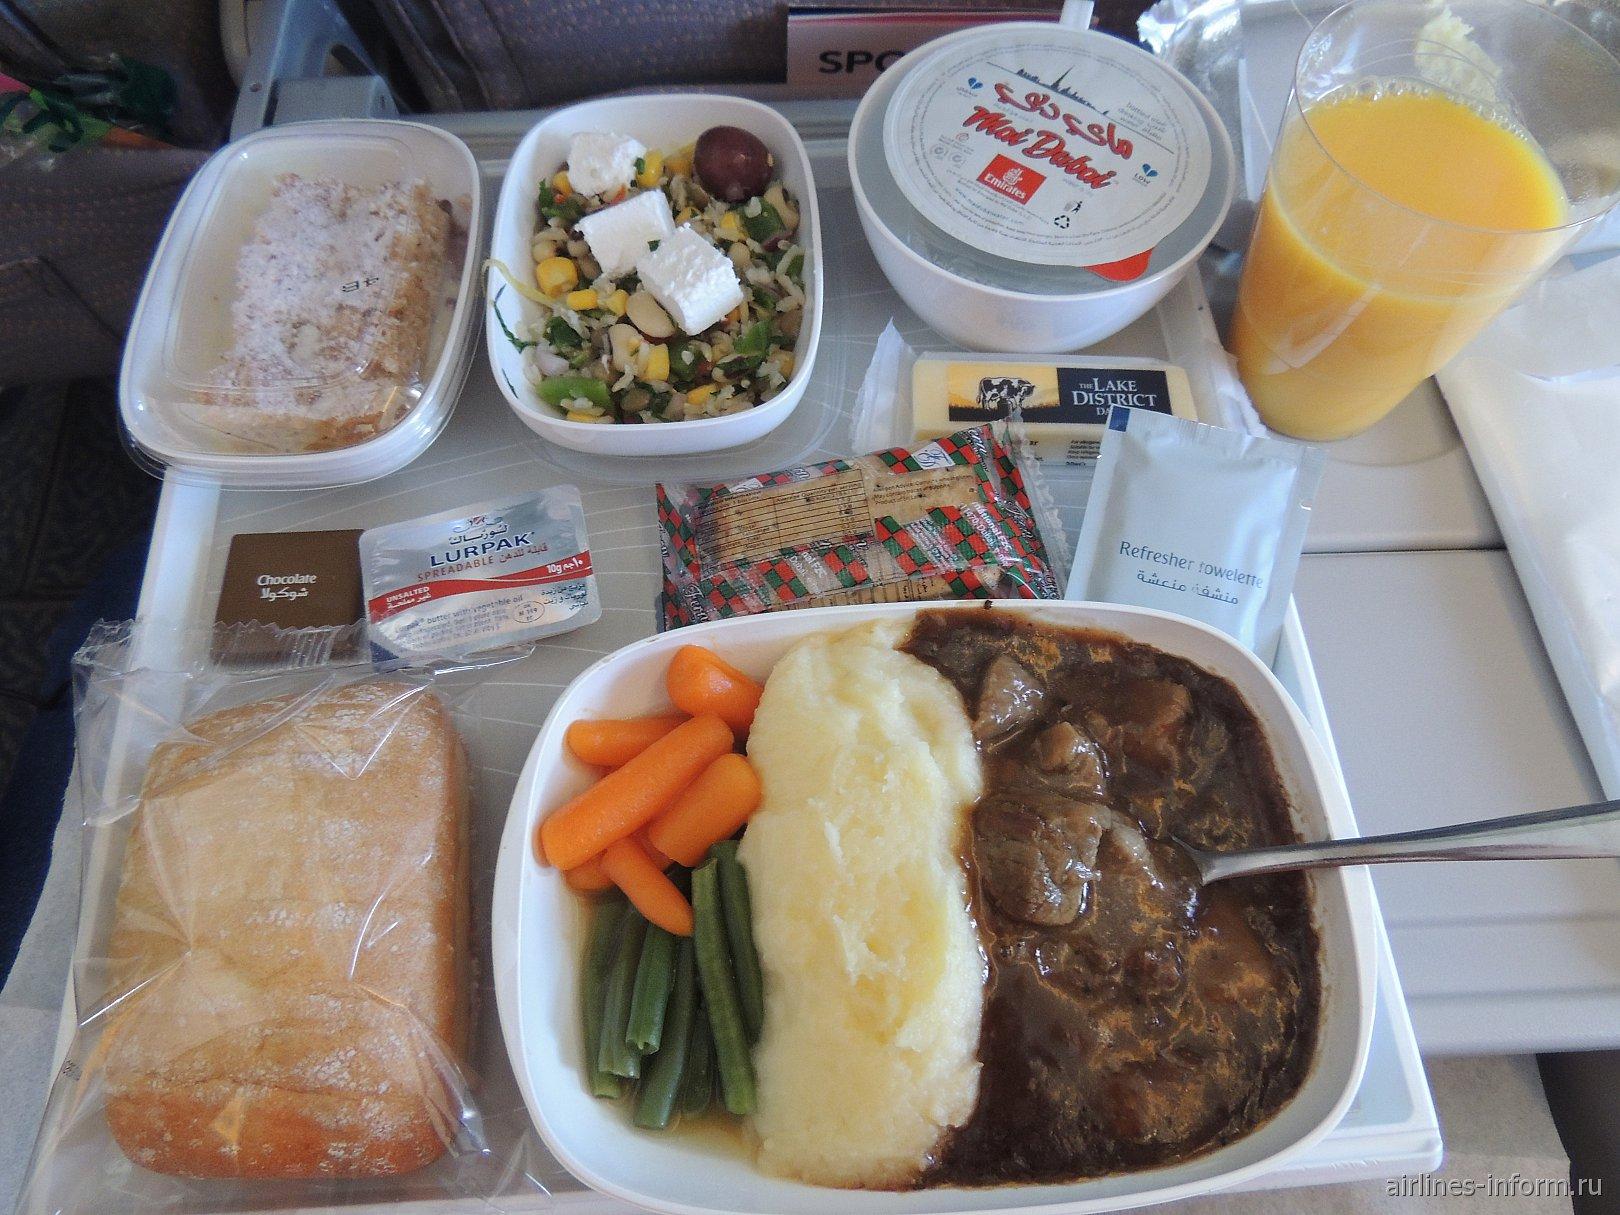 Бортпитание на рейсе Дубай-Москва авиакомпании Emirates